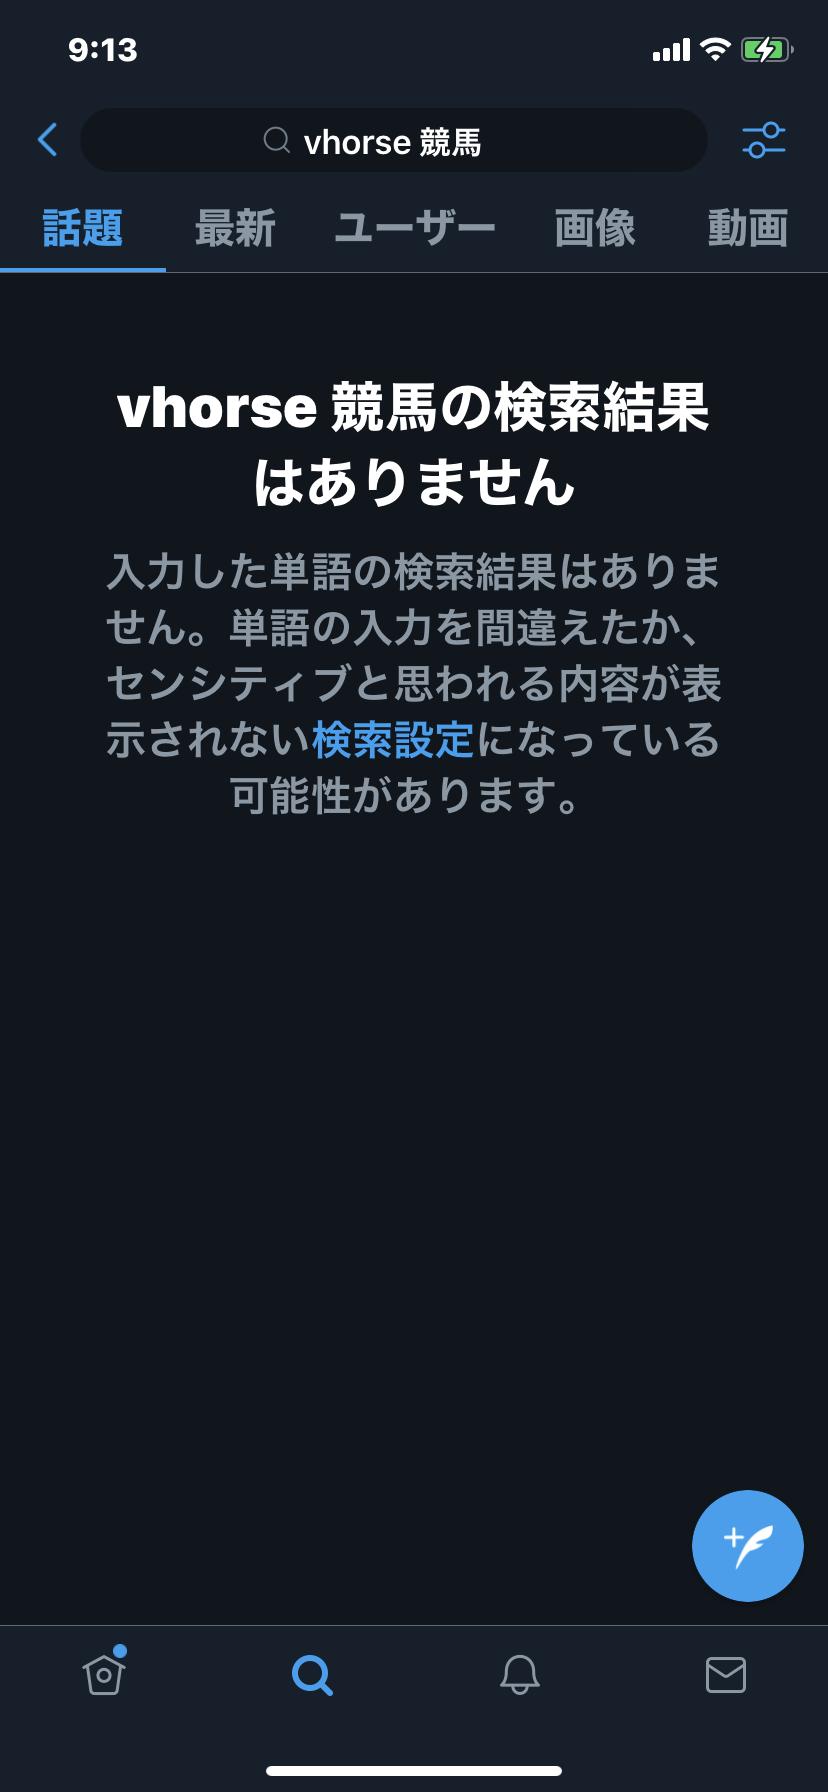 VHorse(ブイホース)【LINE@】検索結果Twitter